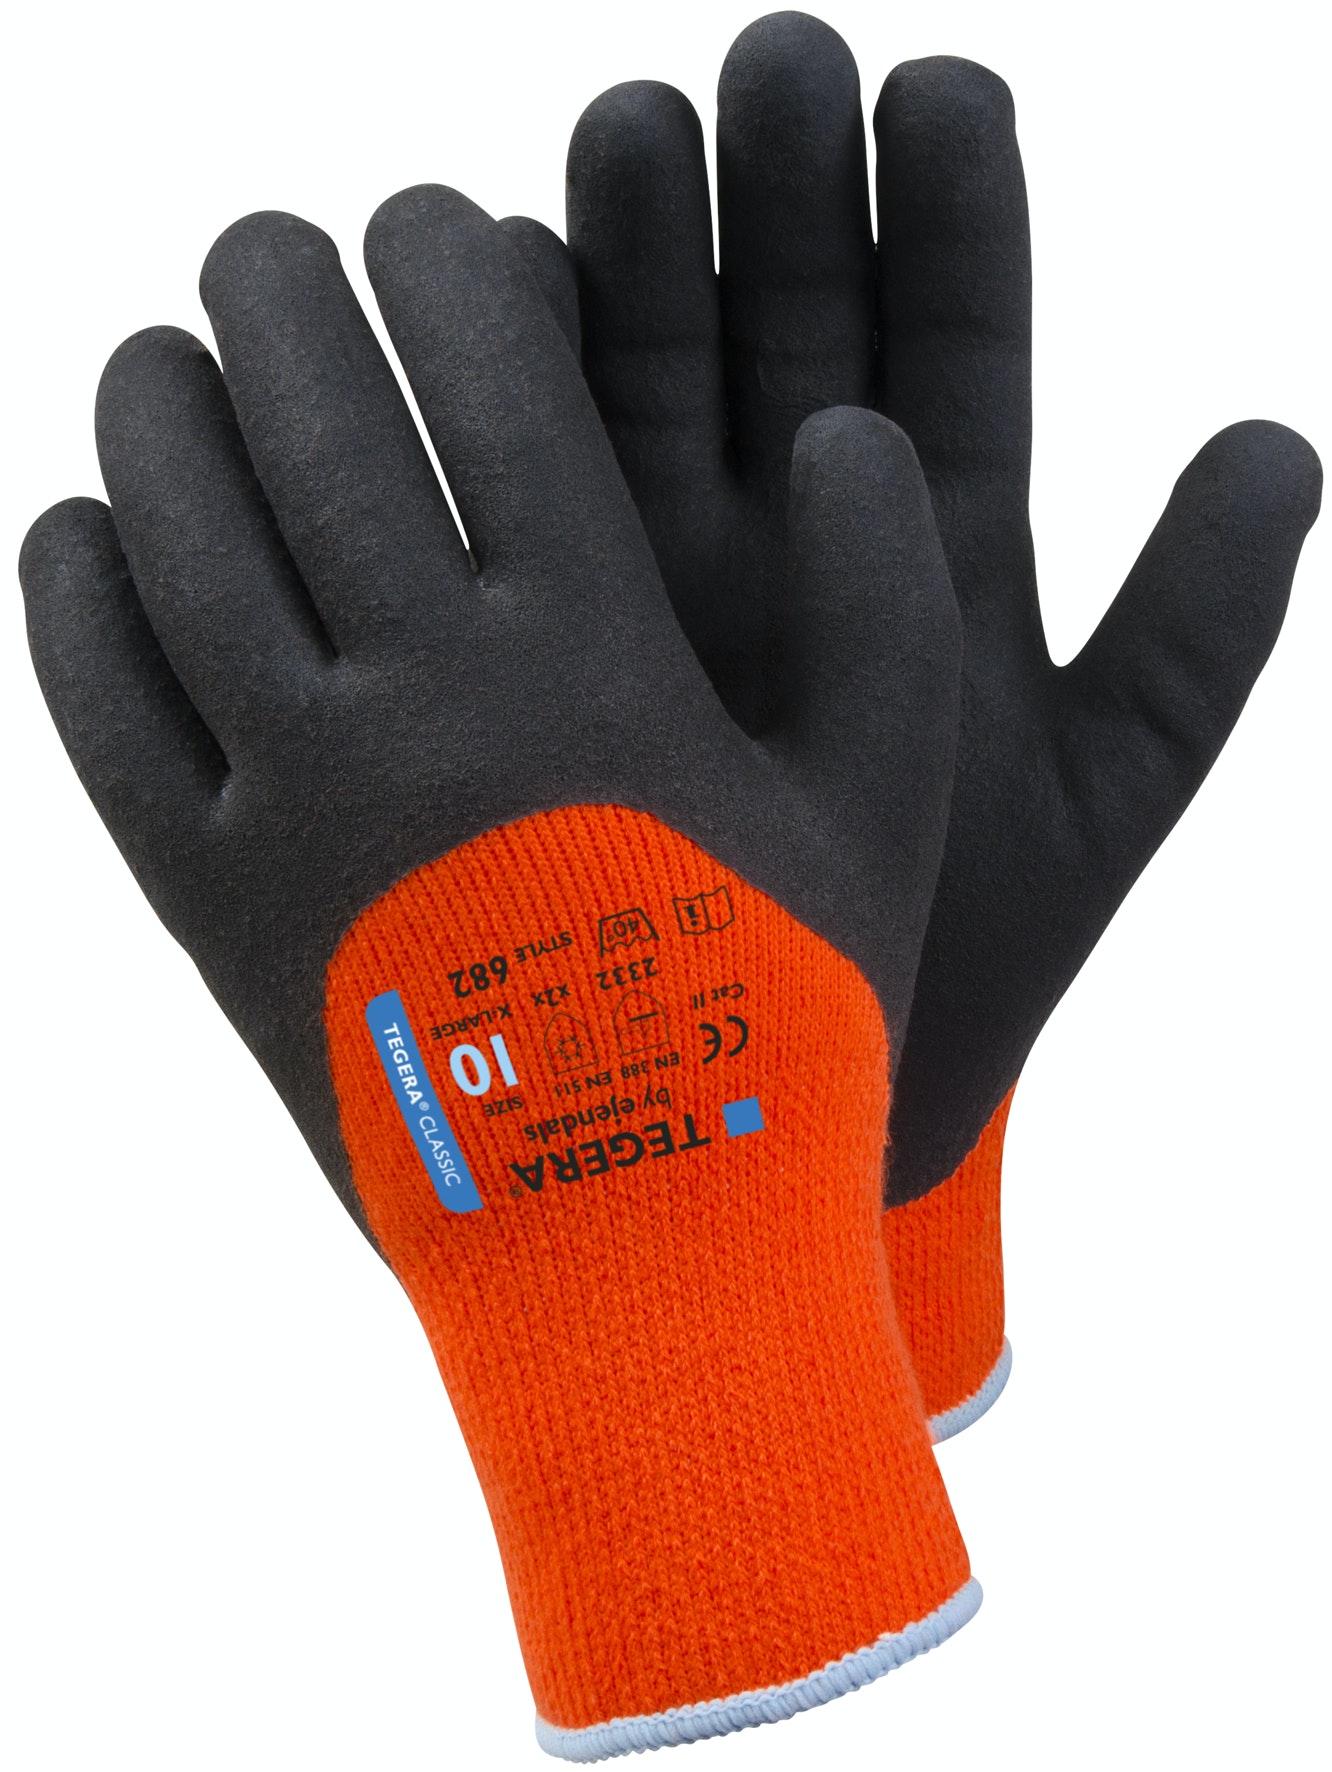 Vinterhandskar Tegera 682 Orange Stl 10